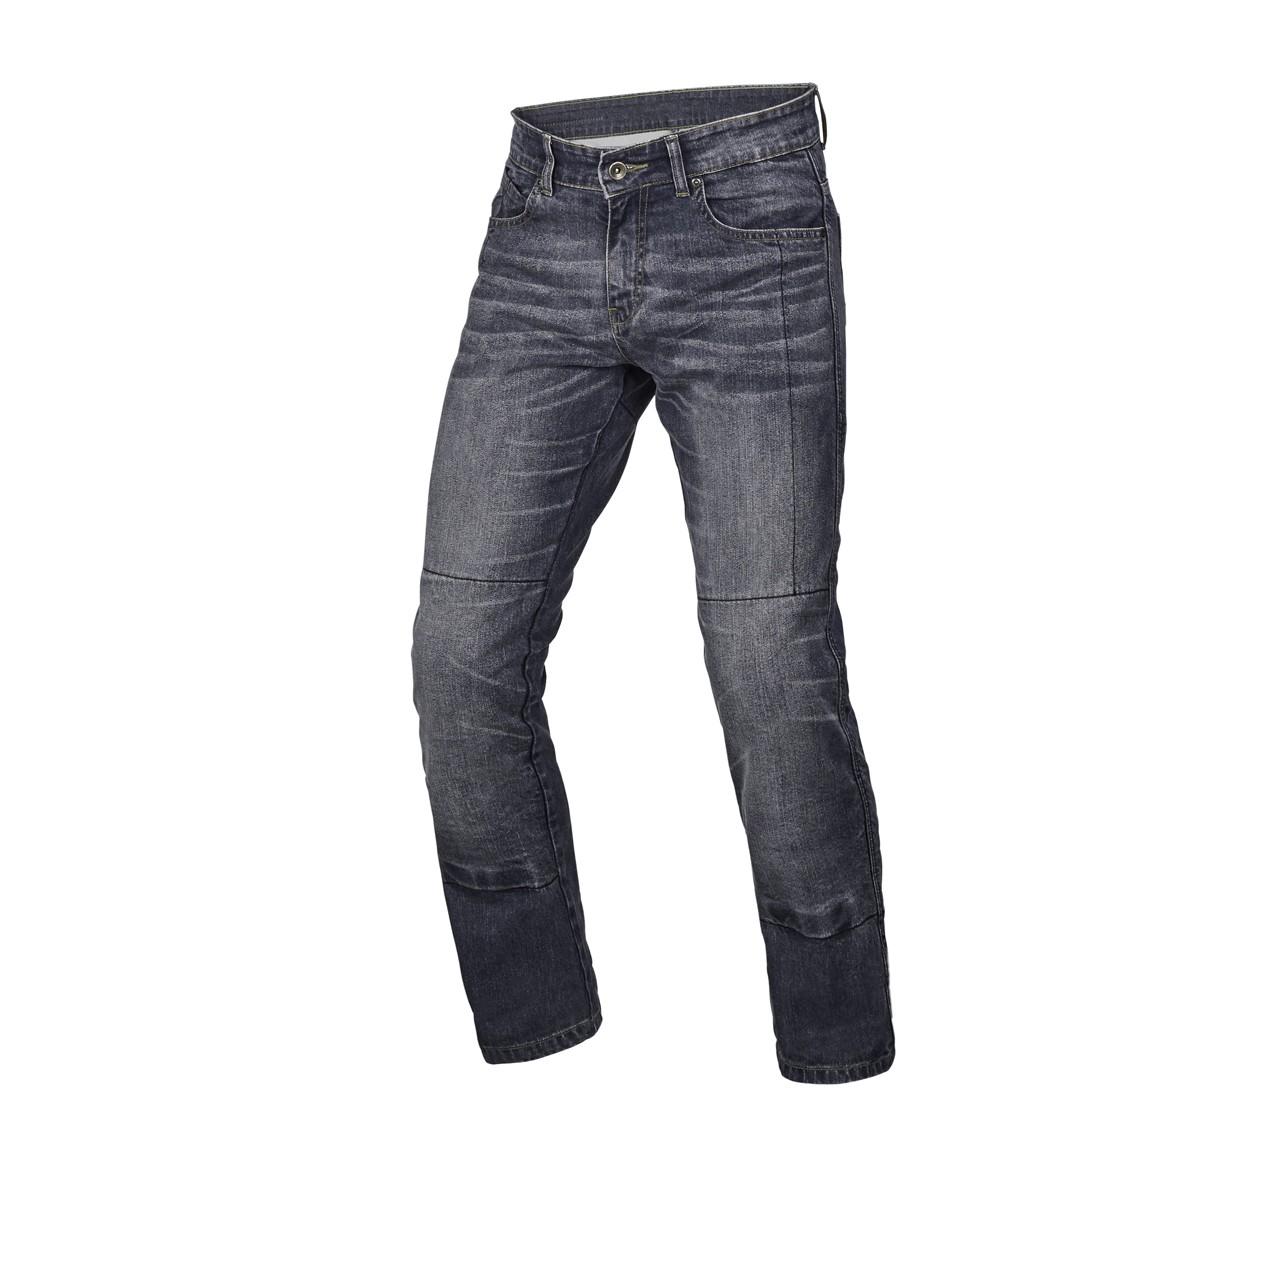 Tekstilinės vasarinės kelnės MACNA Revelin (Dark grey)